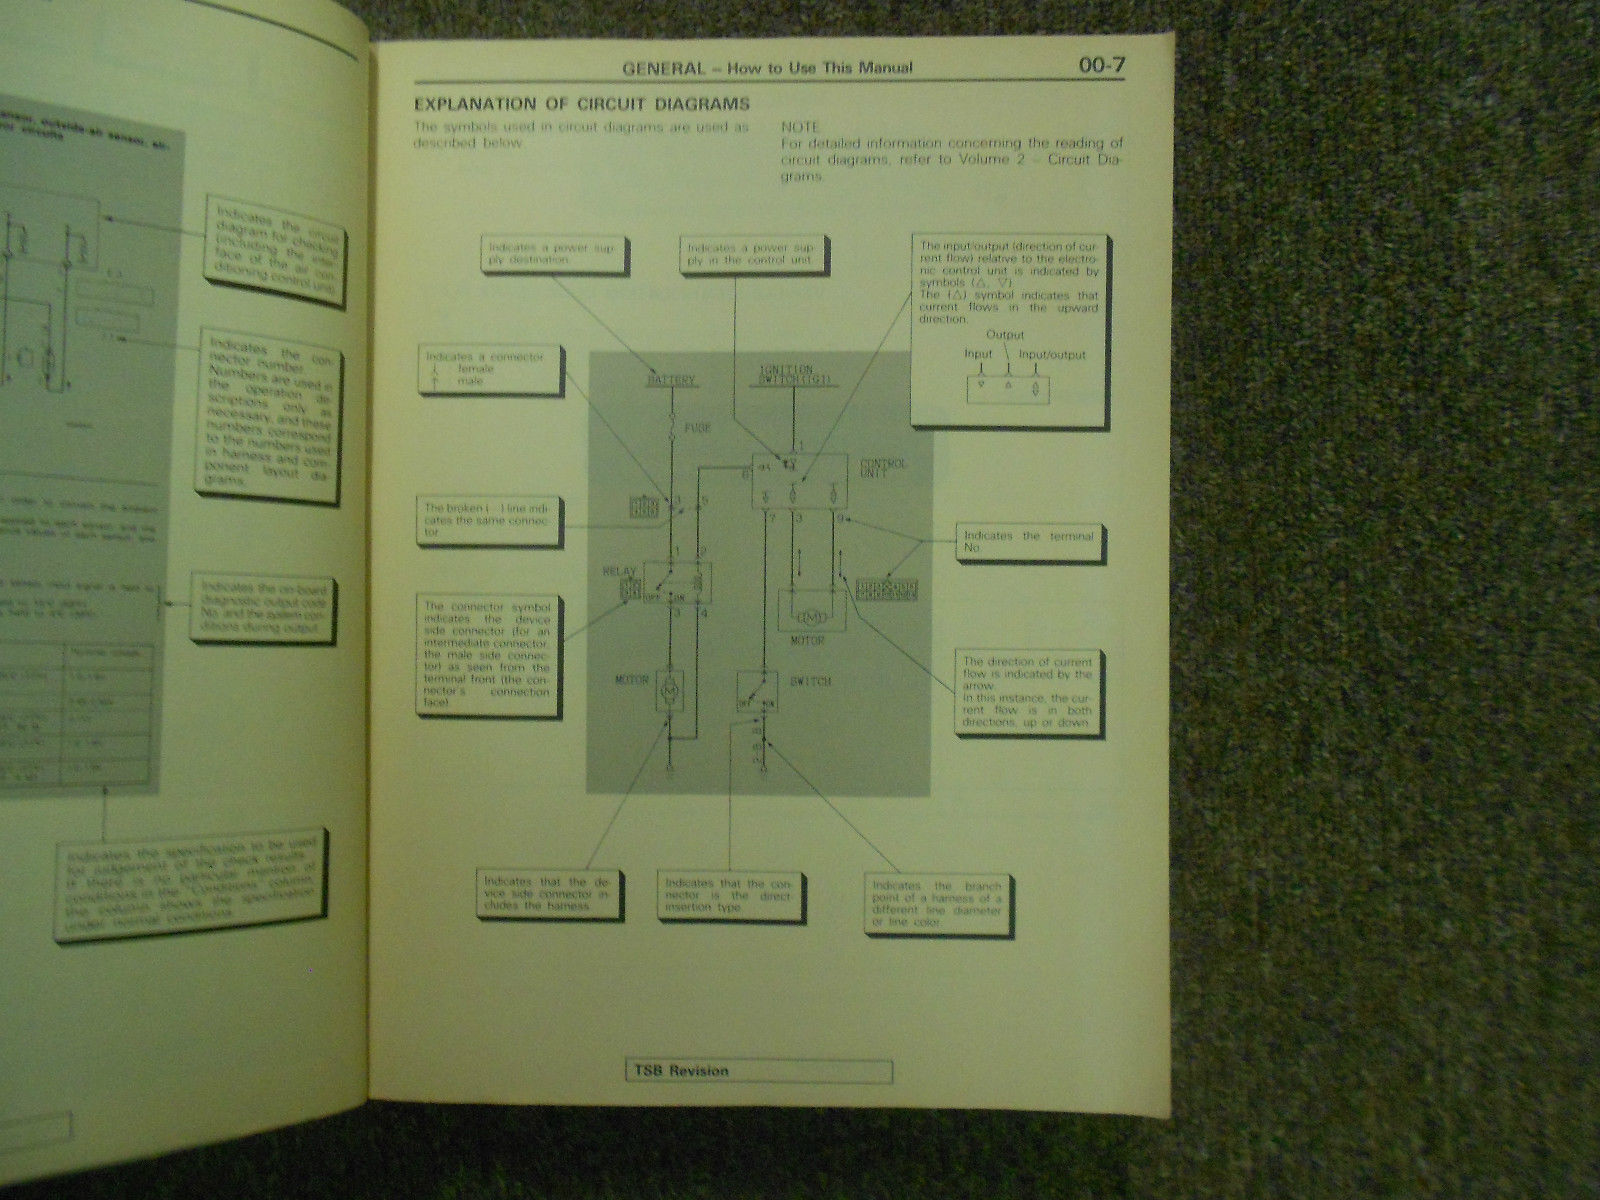 hight resolution of 1992 1996 mitsubishi diamante service repair shop manual vol 1 factory oem 92 96